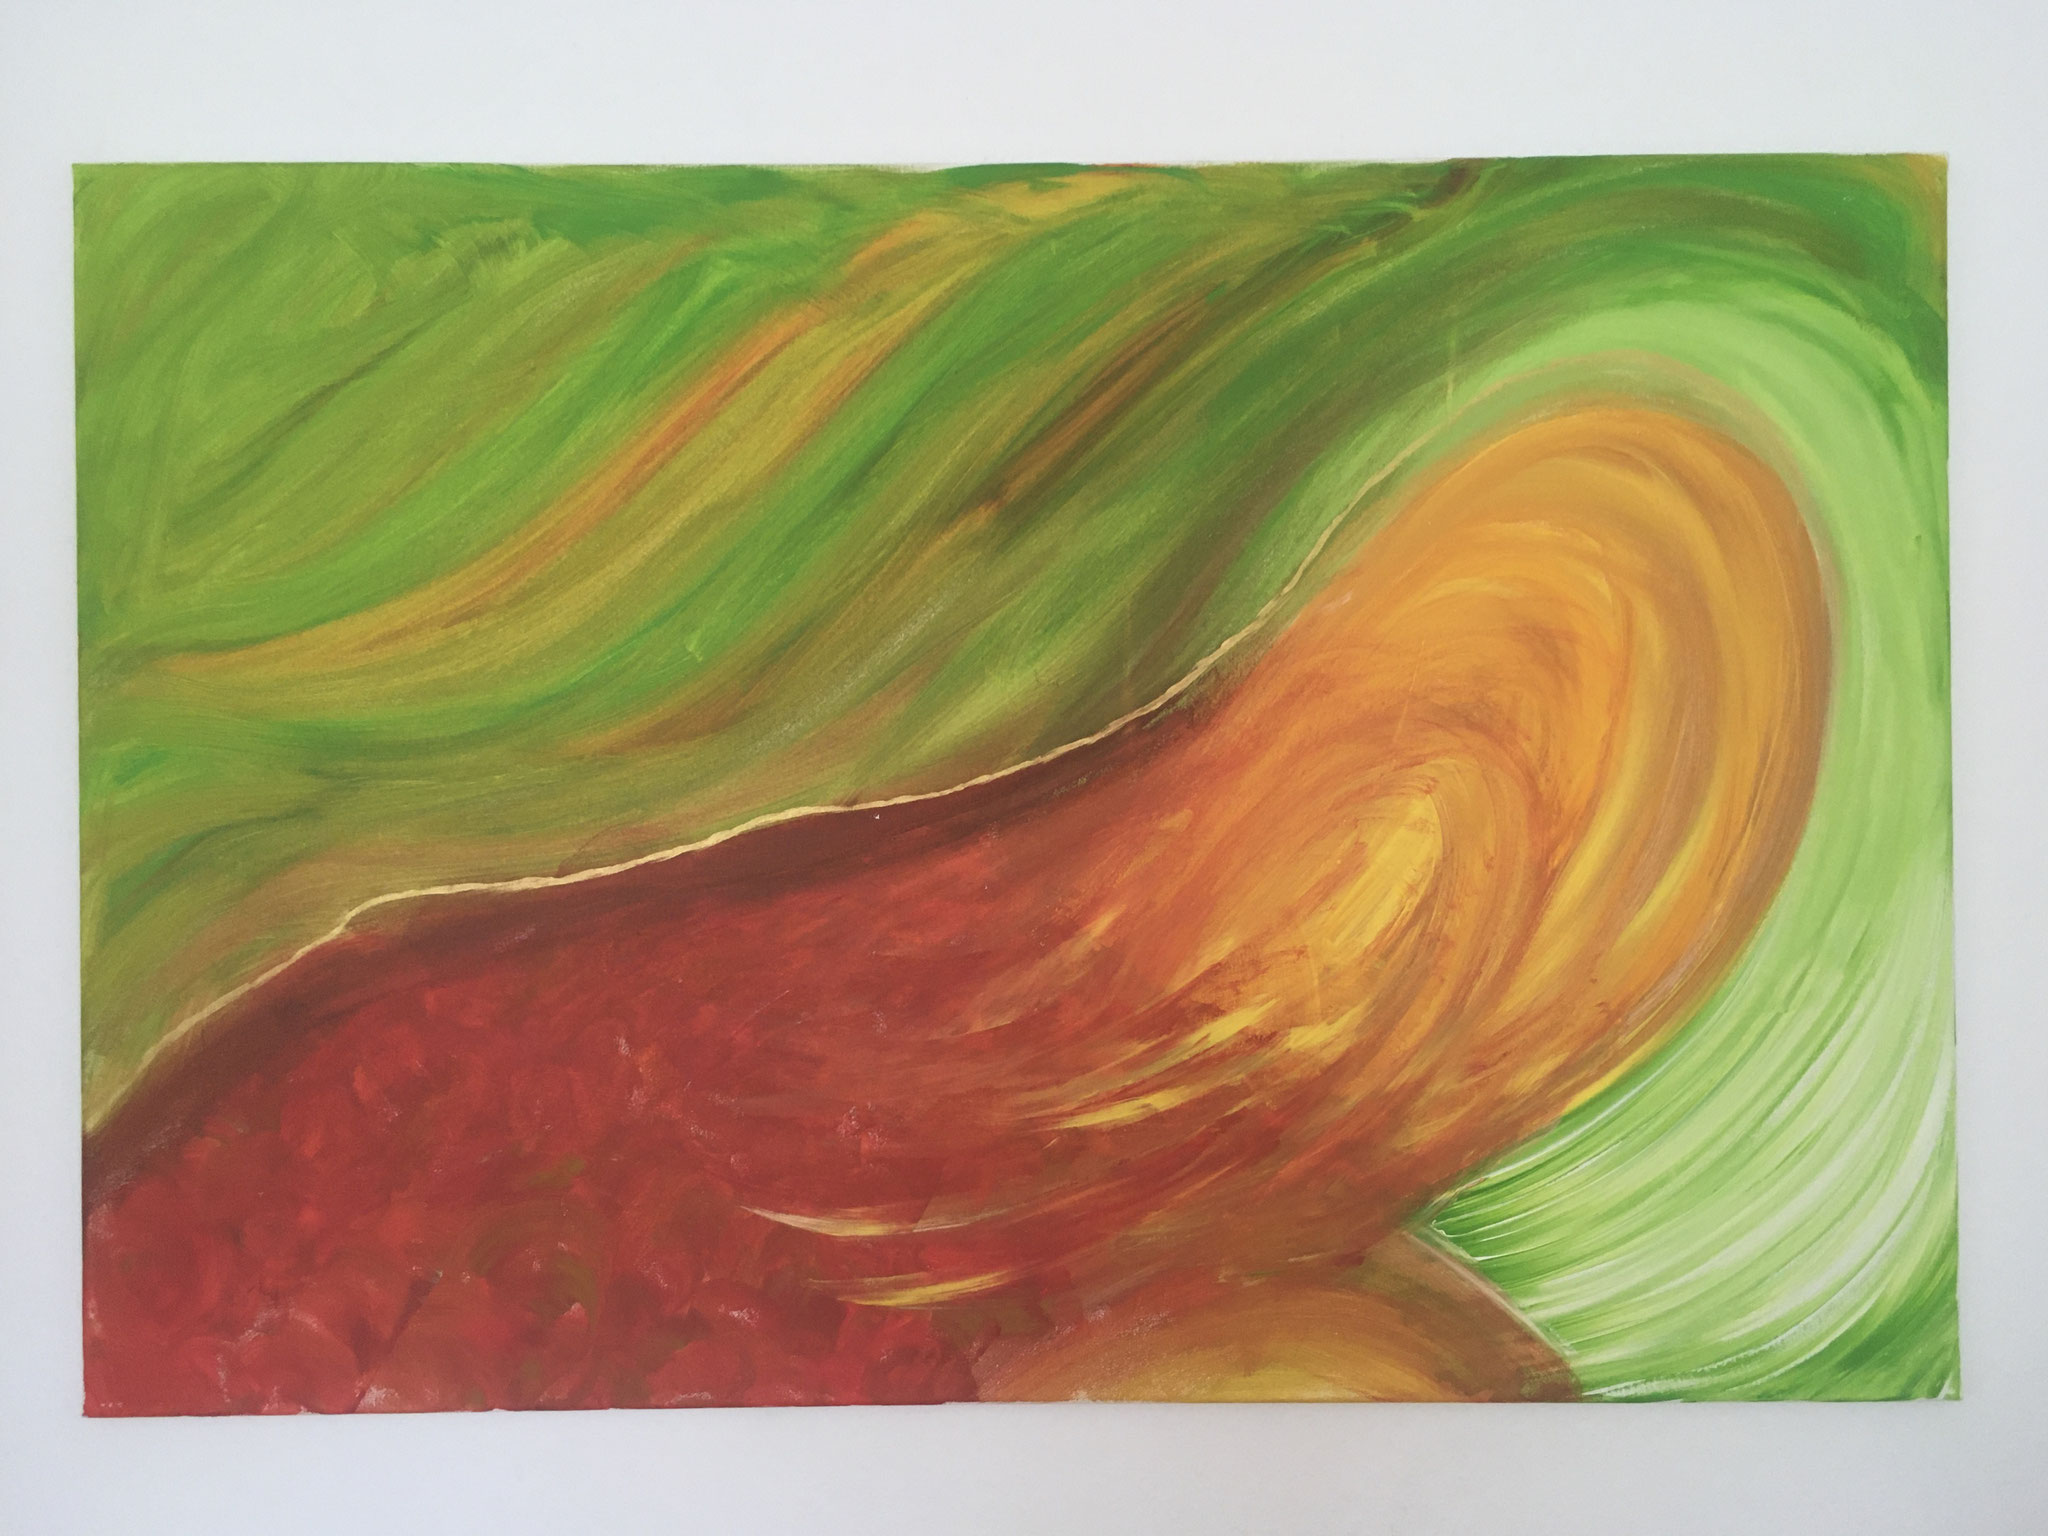 Halbe Blüte (80x120cm)